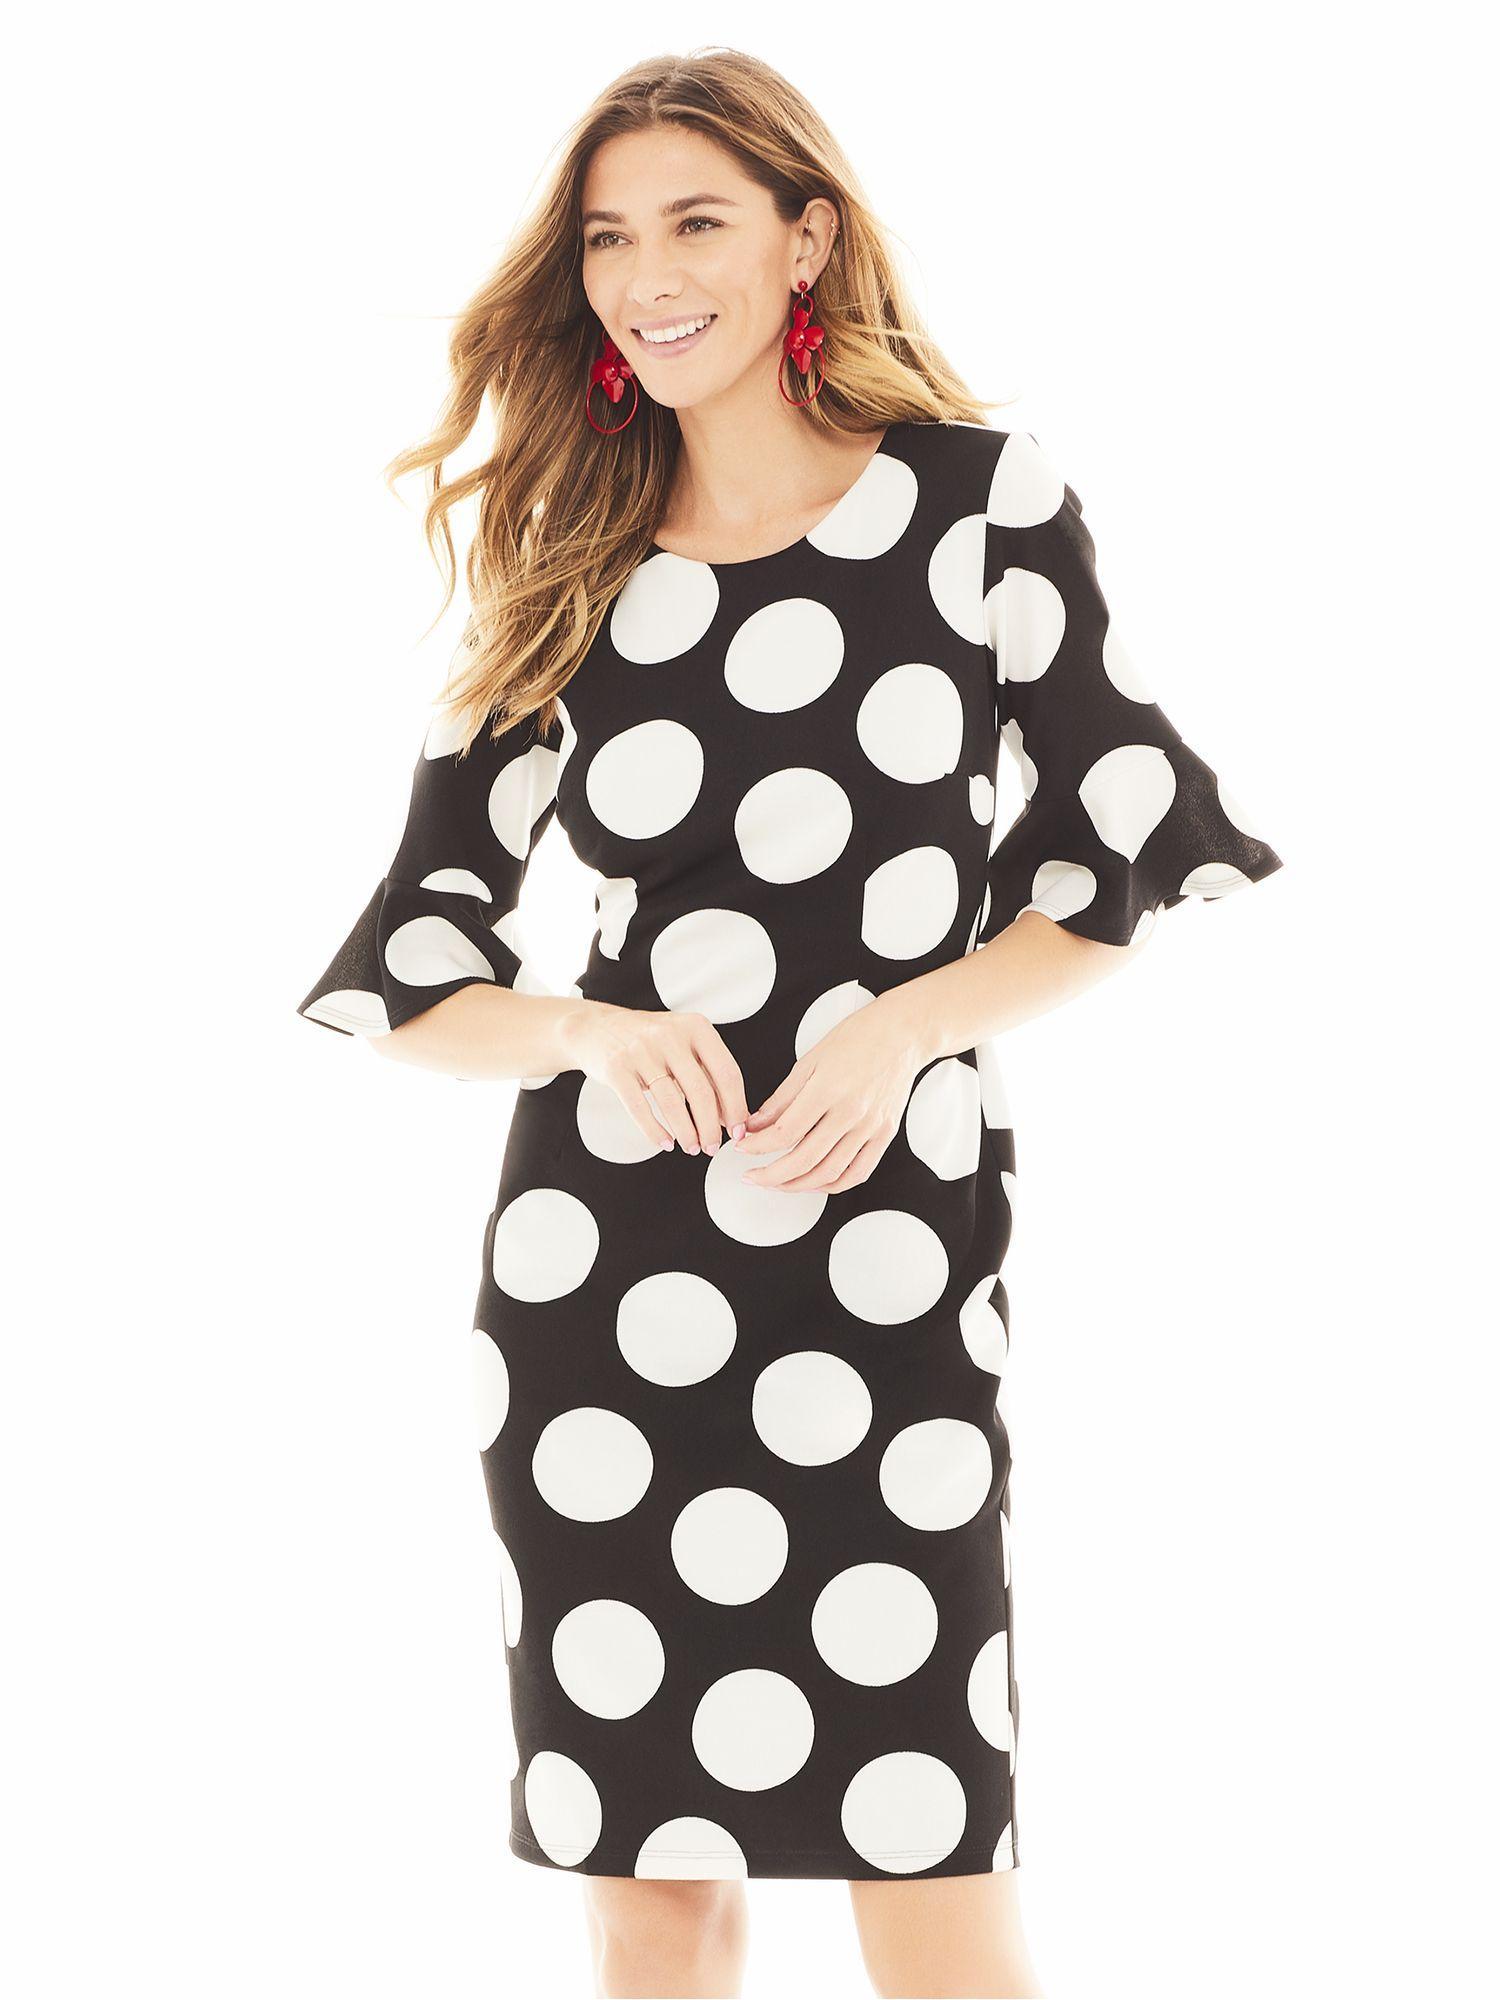 e8dd66fa New York & Company. Women's Black Dot-print Sheath Dress - Magic Crepe - 7th  Avenue